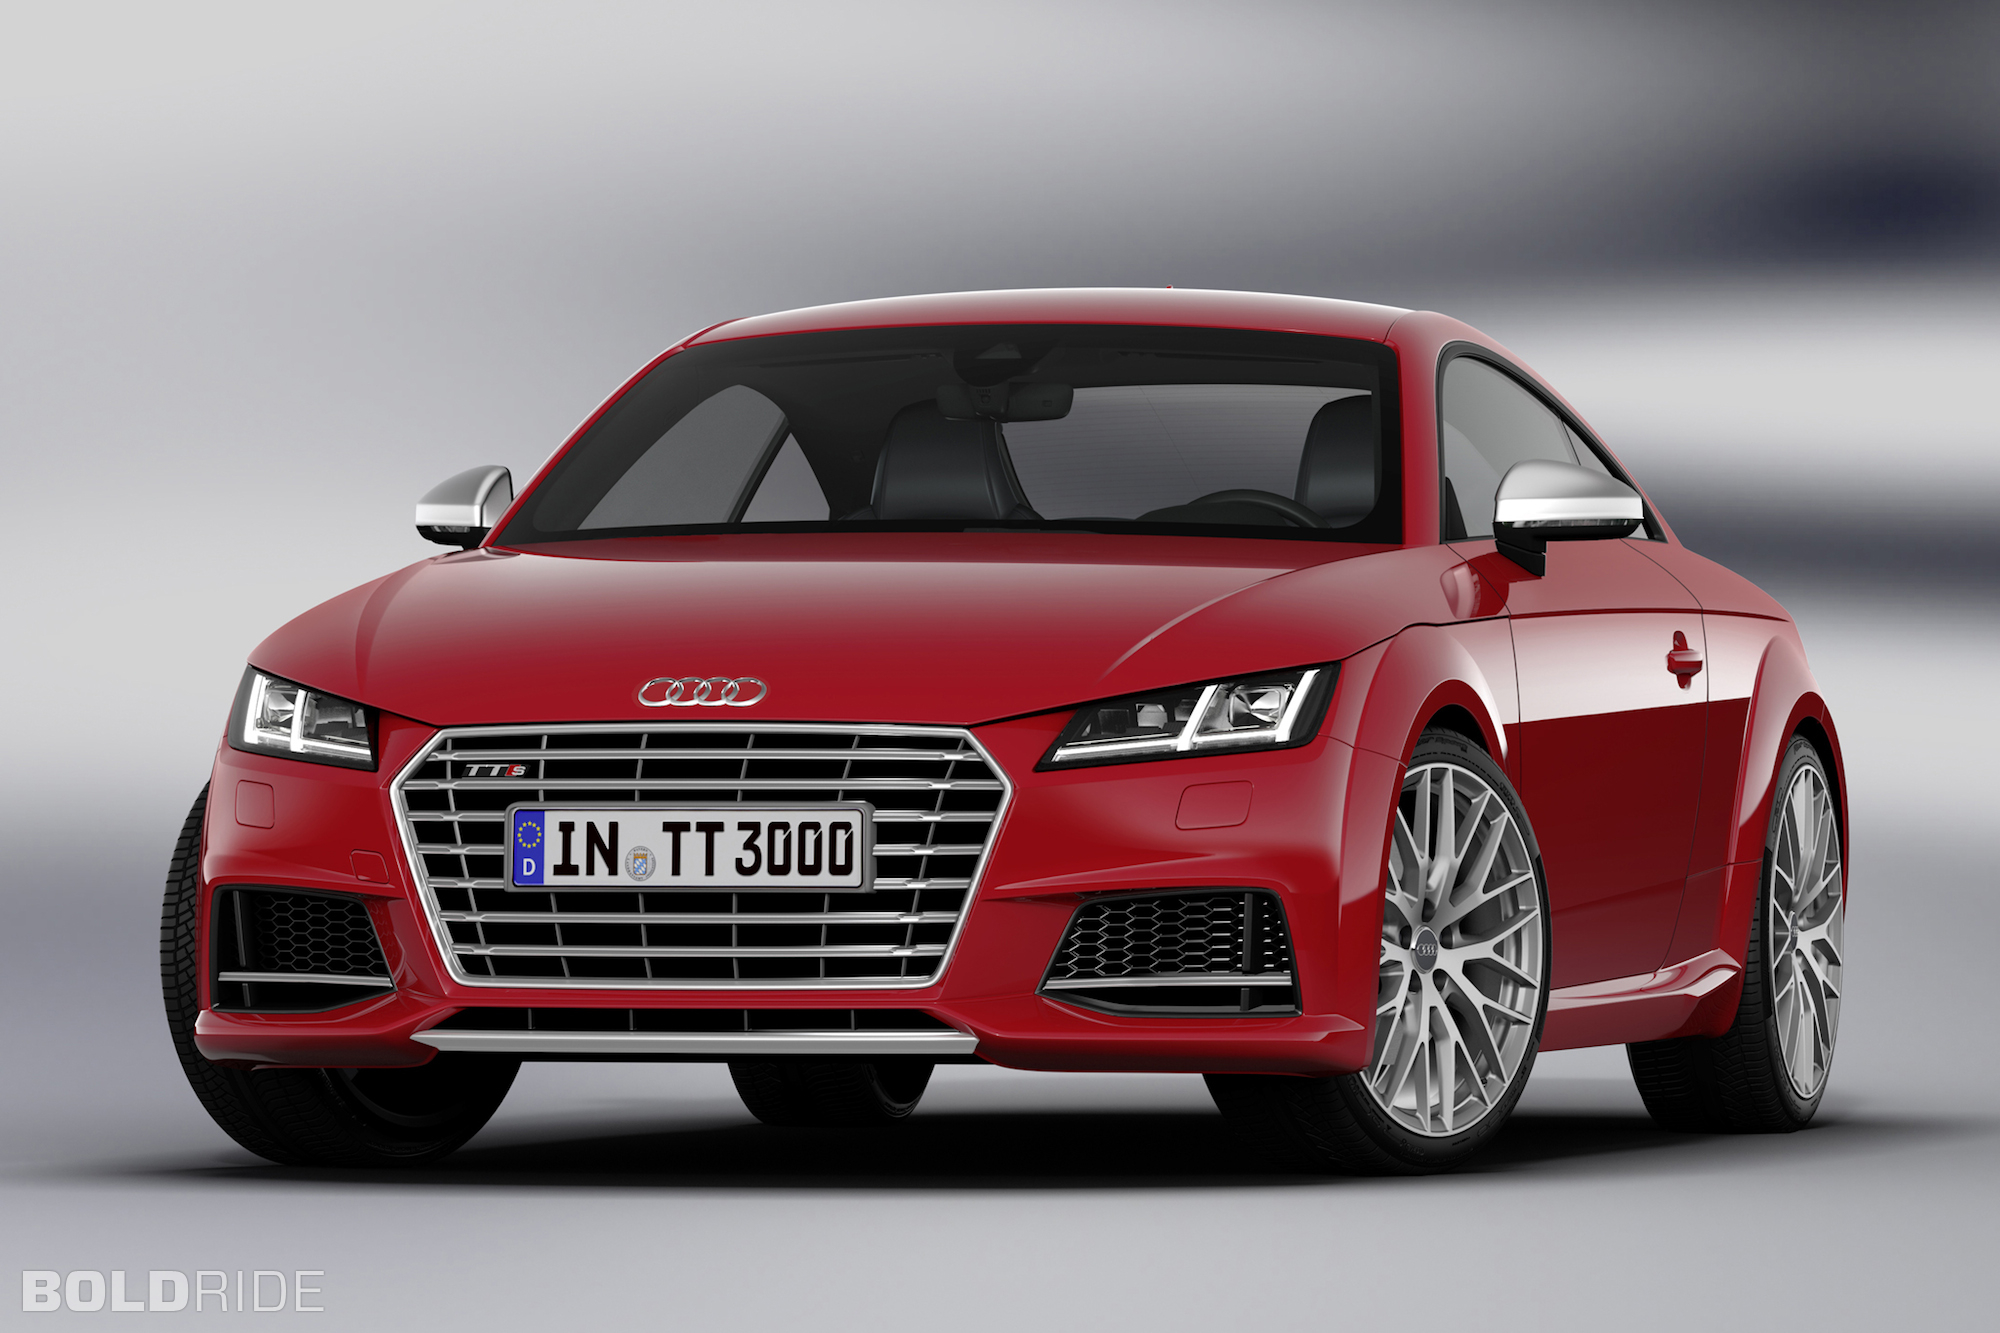 2015 Audi Tt Image 9